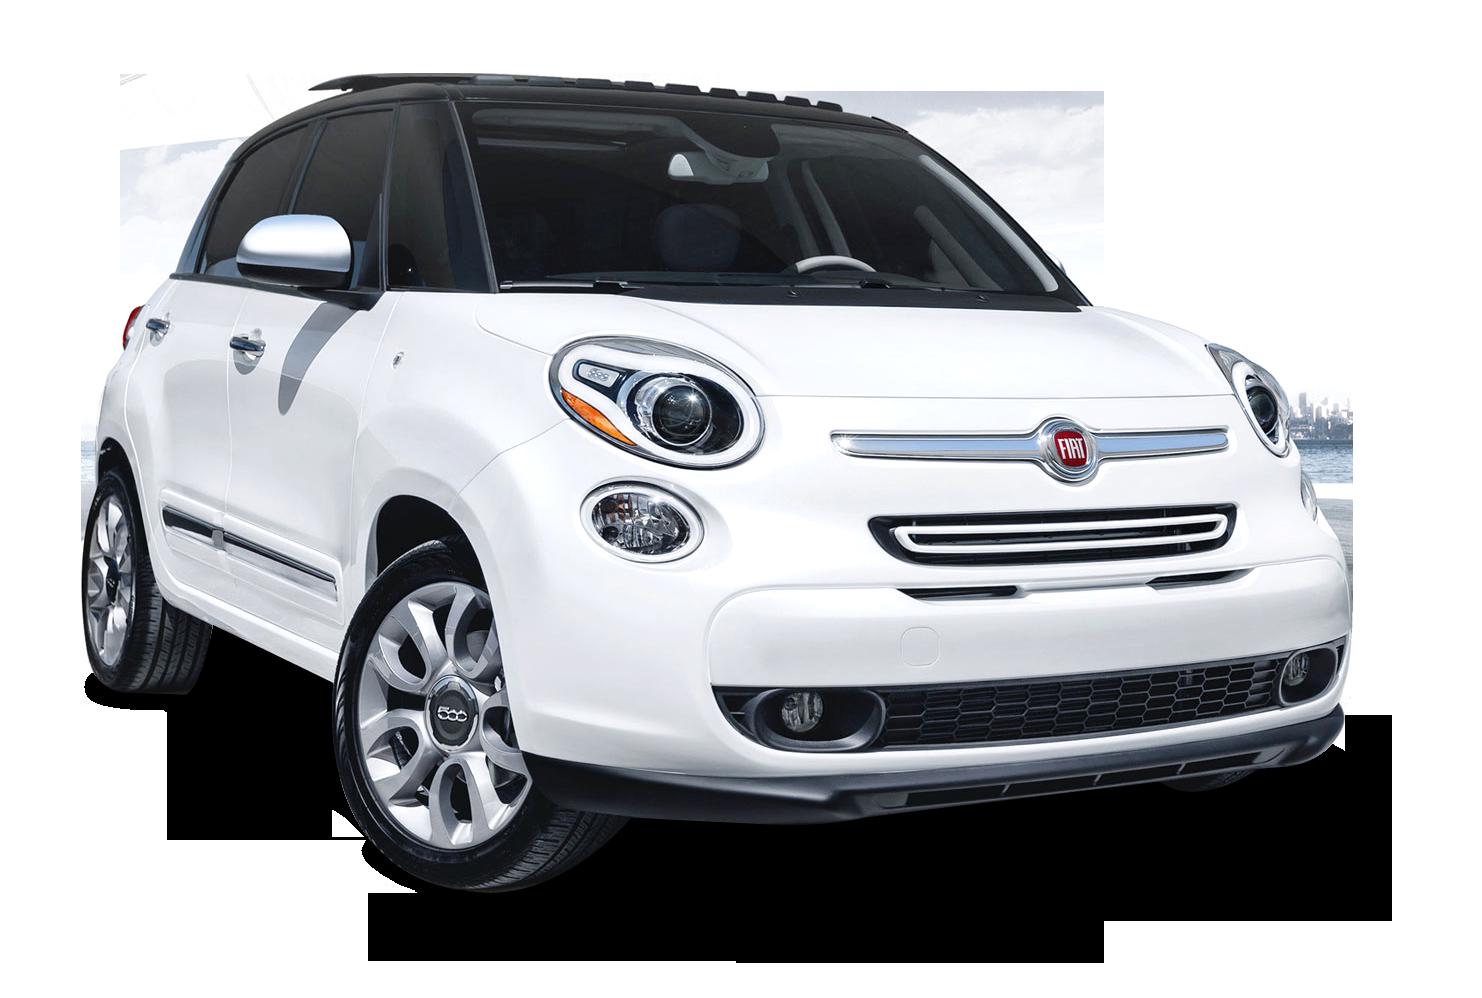 White Fiat 500L Car PNG Image